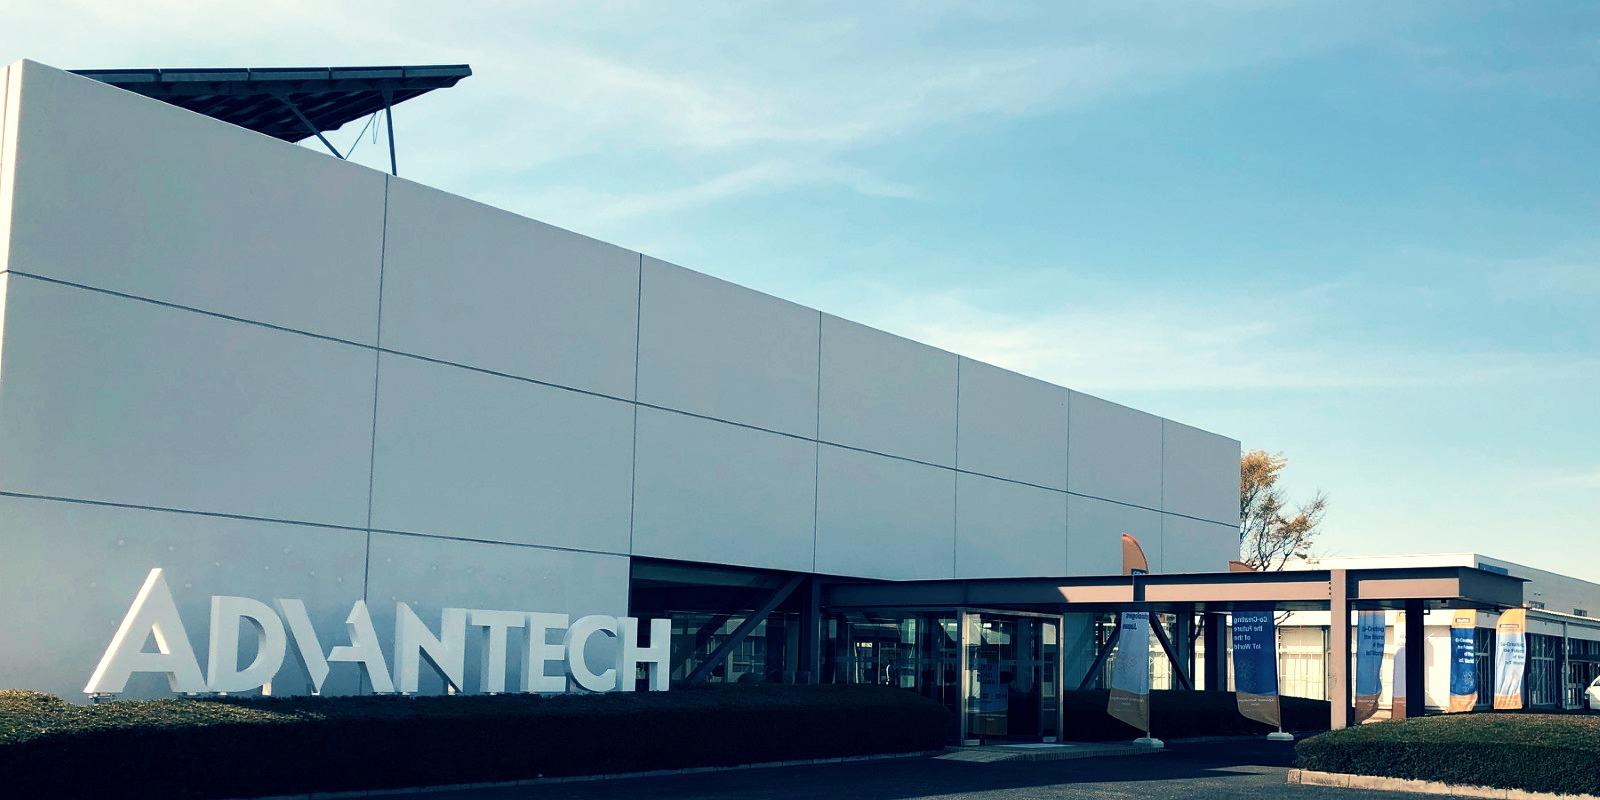 IIoT chip maker Advantech hit by ransomware, $12.5 million ransom